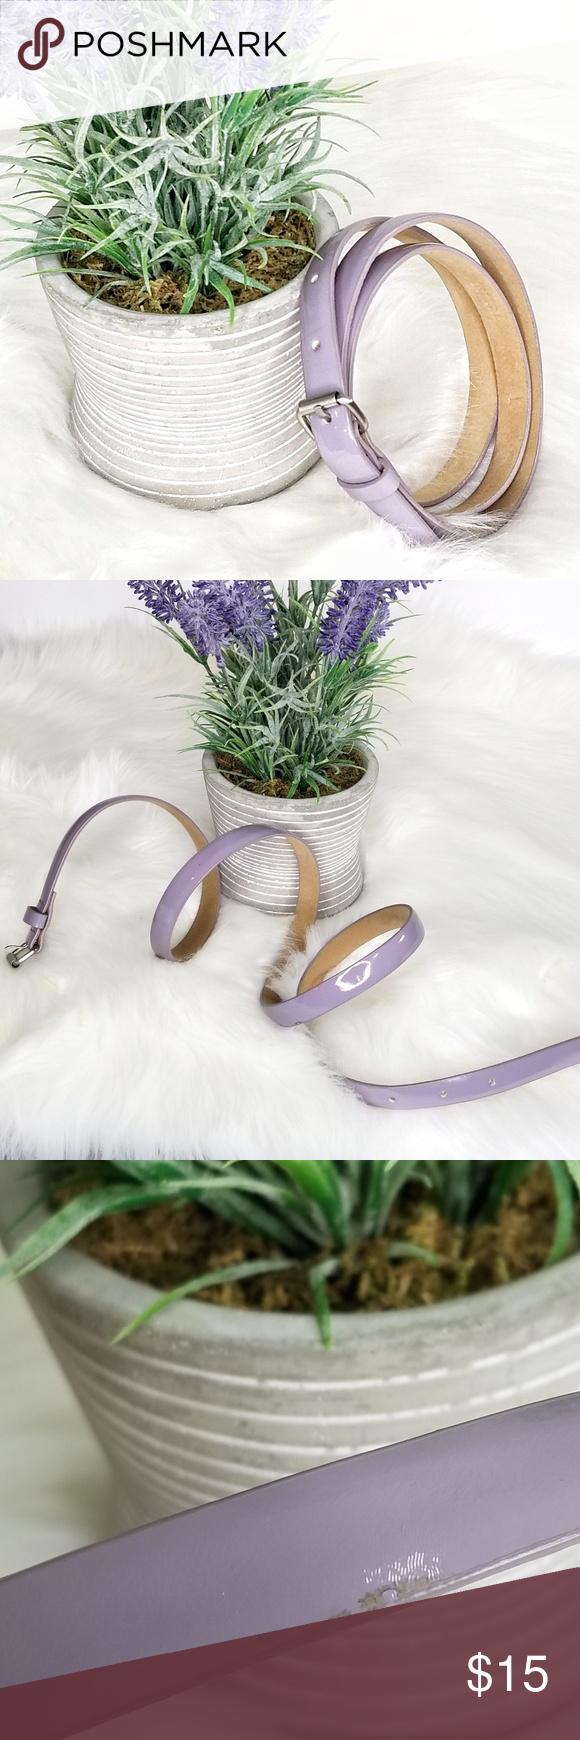 Ann Taylor Smoky Purple Patent Leather Skinny Belt Ann Taylor Smoky Purple Patent Leather Skinny Belt Women's L Large  Style: #181374 Length: 42